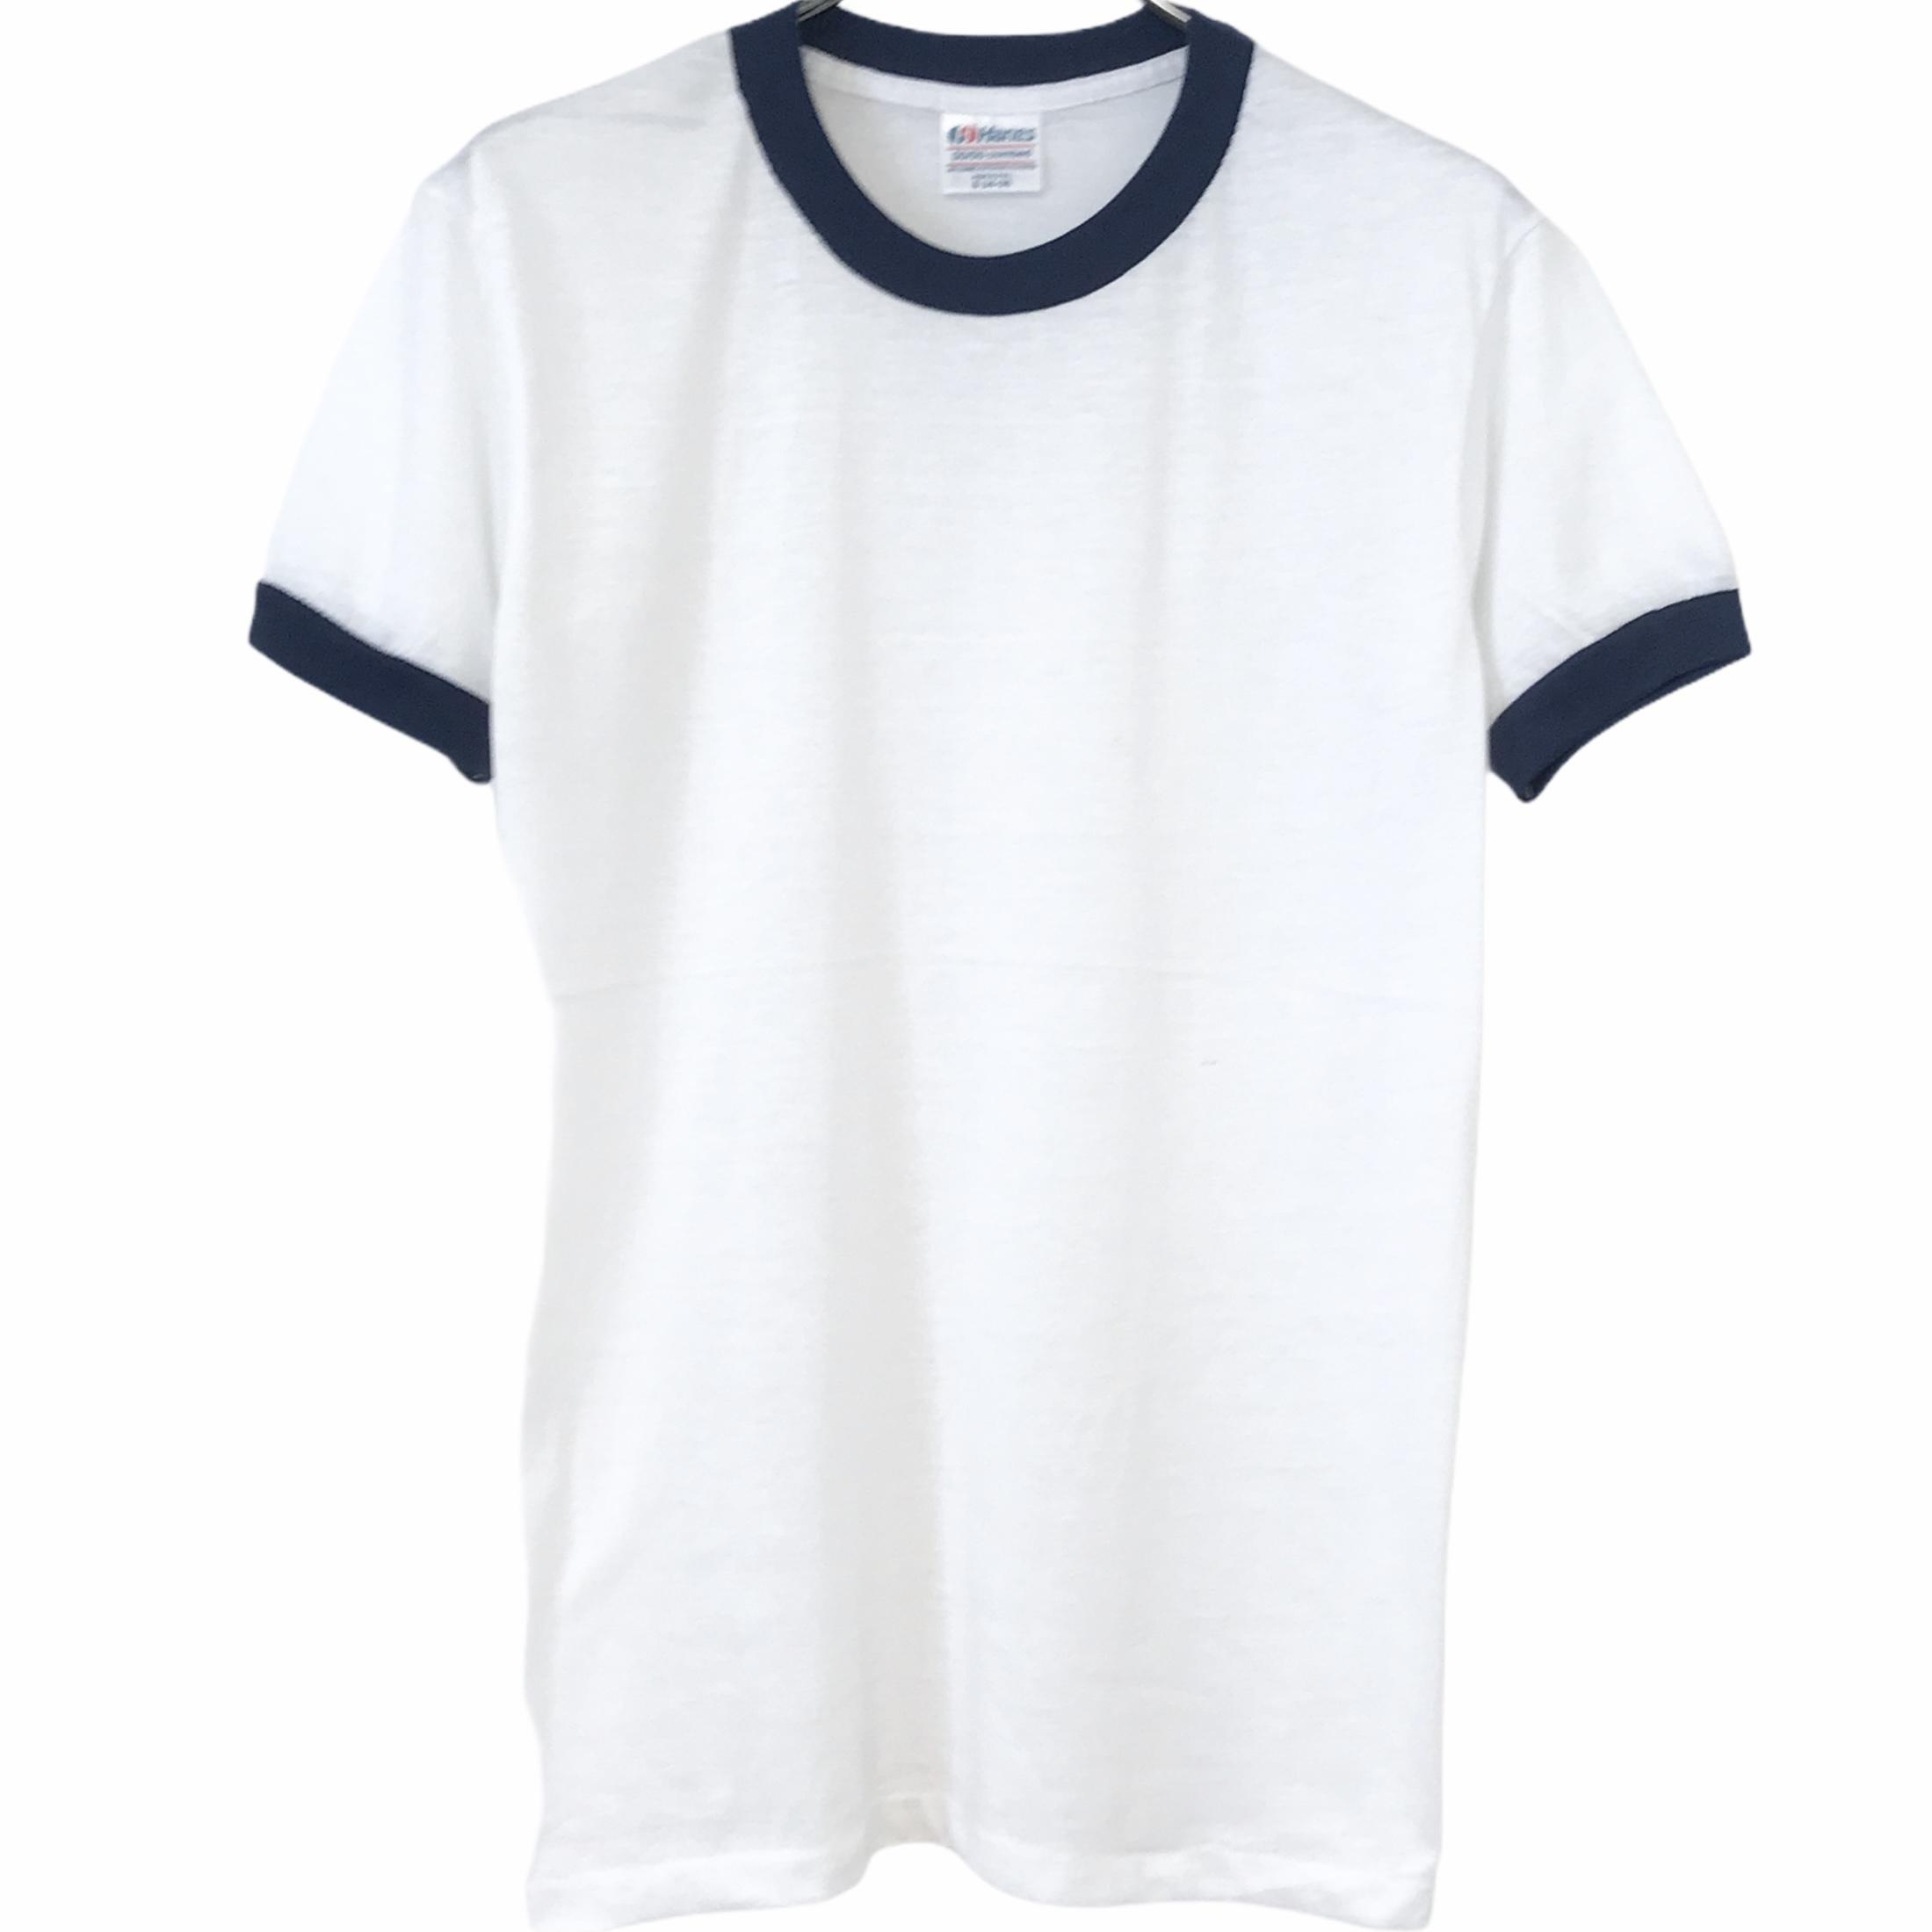 Dead Stock! 80's Hanes Ringer T-shirt made in USA Navy